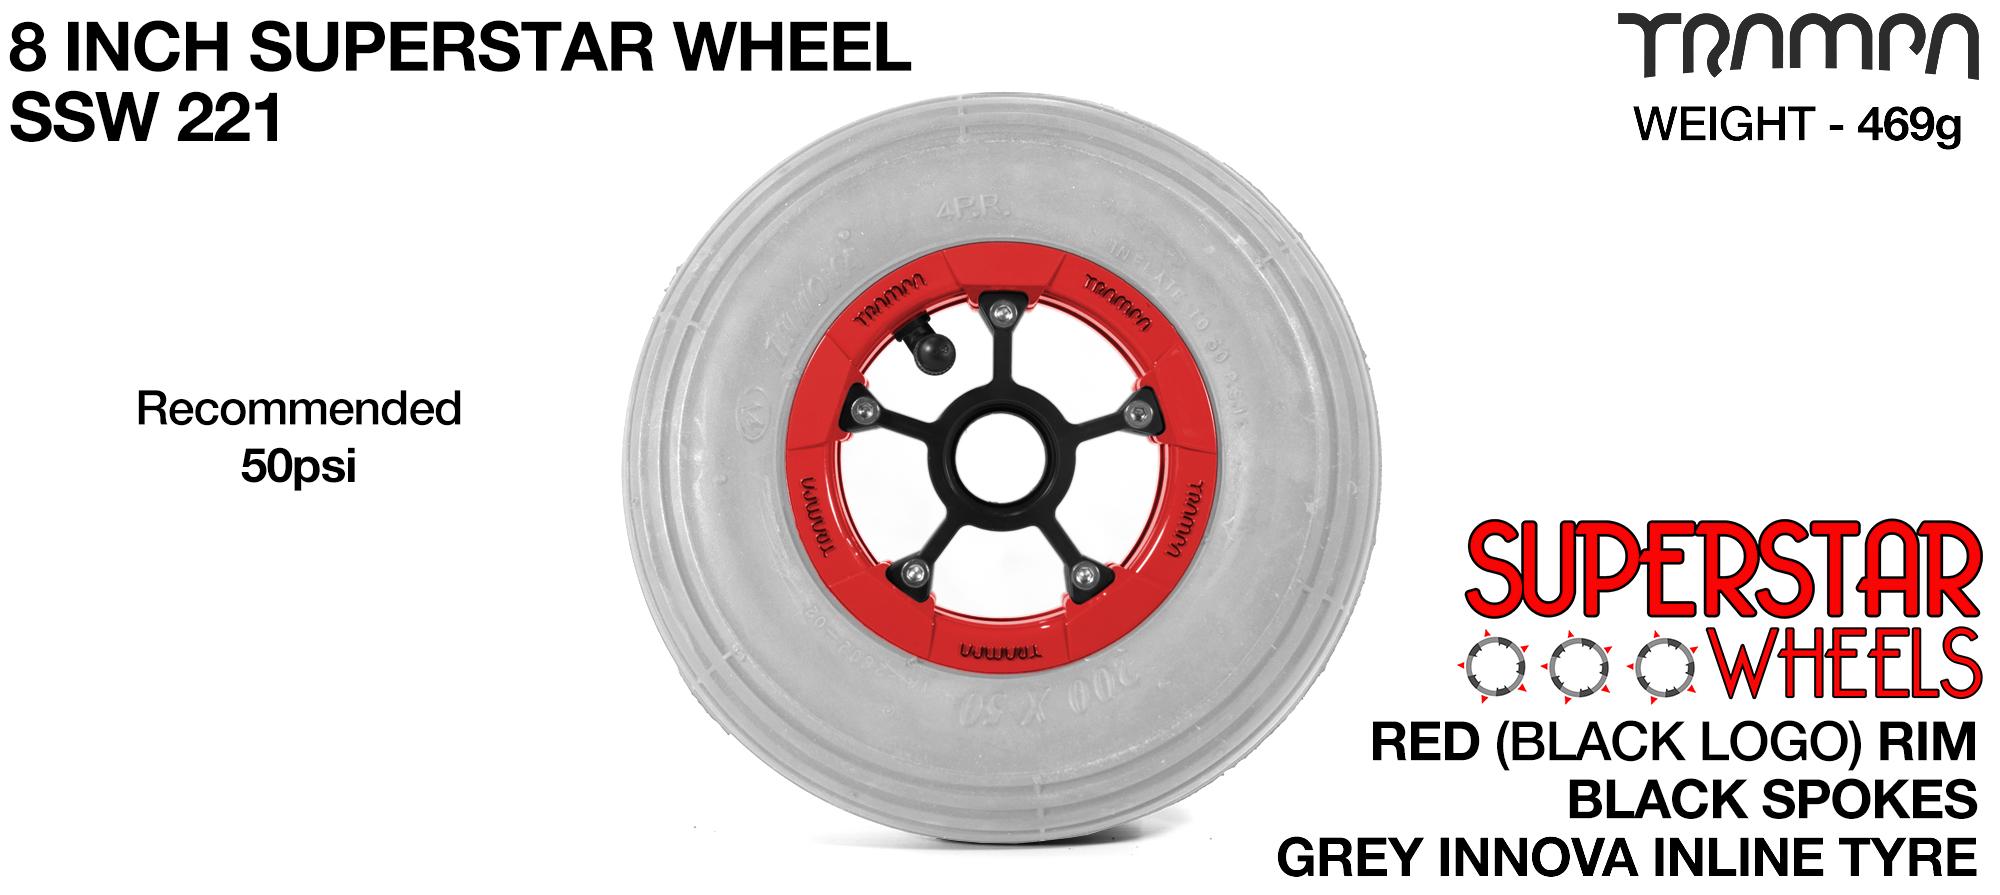 Superstar 8 Inch Wheel - Red Superstar Rim Black Anodised Spokes & Grey 8 Inch Inline Tyre